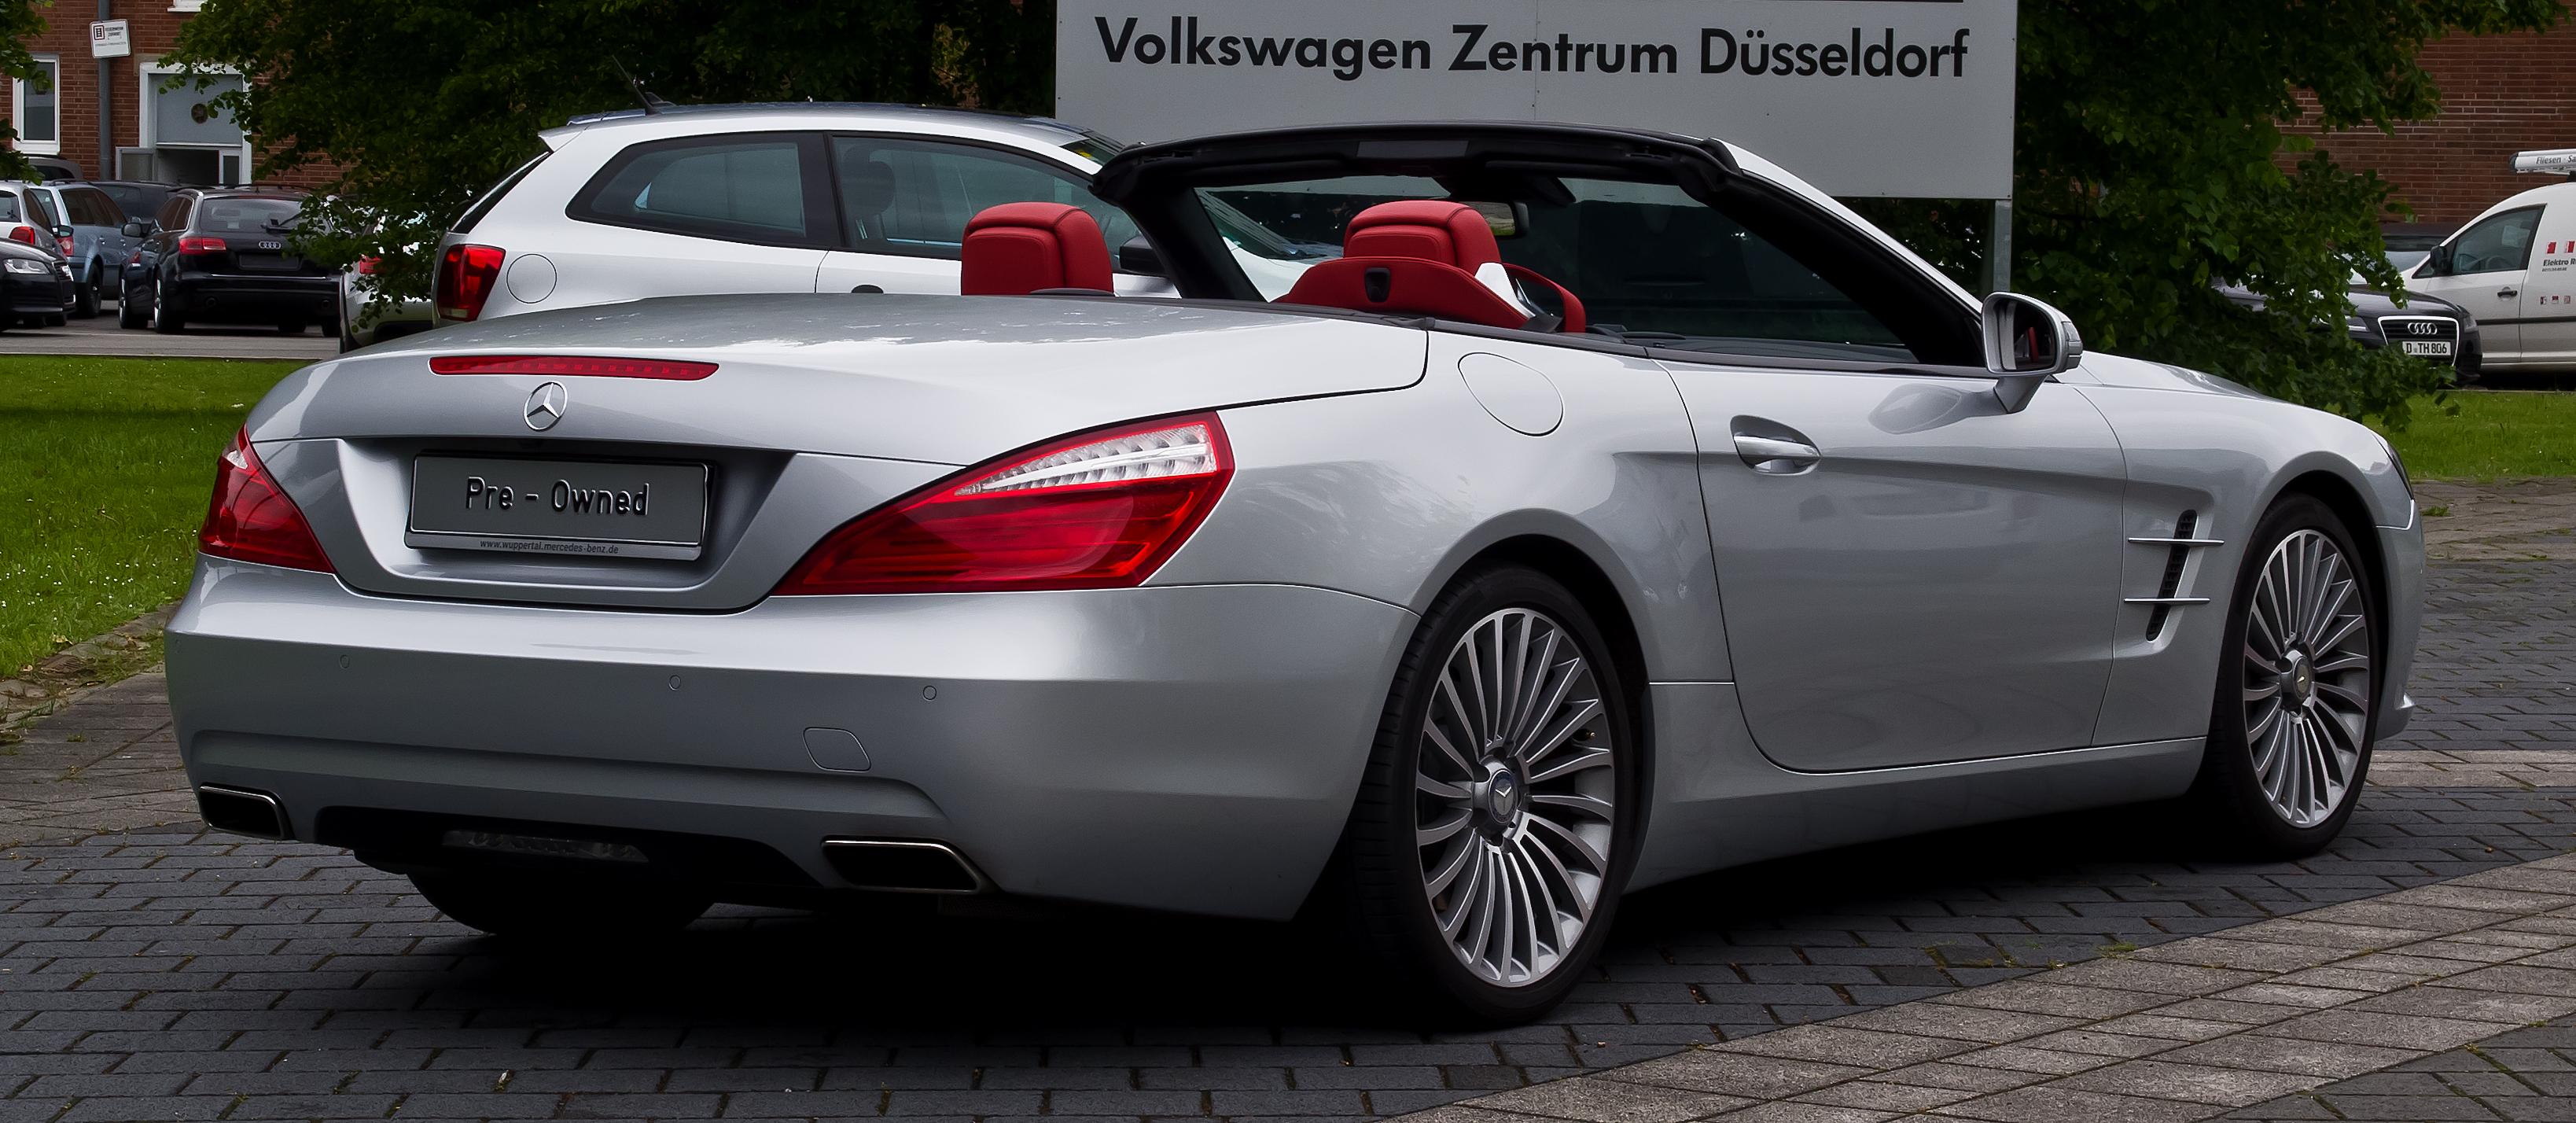 Foto furthermore 729947 Essai Mercedes Classe S 2013 W222 moreover T78020 Volant Amg further Mercedes Benz A 220 Cdi Amg further Mercedes Benz E 350 Cdi W212 Kombi. on mercedes benz e 350